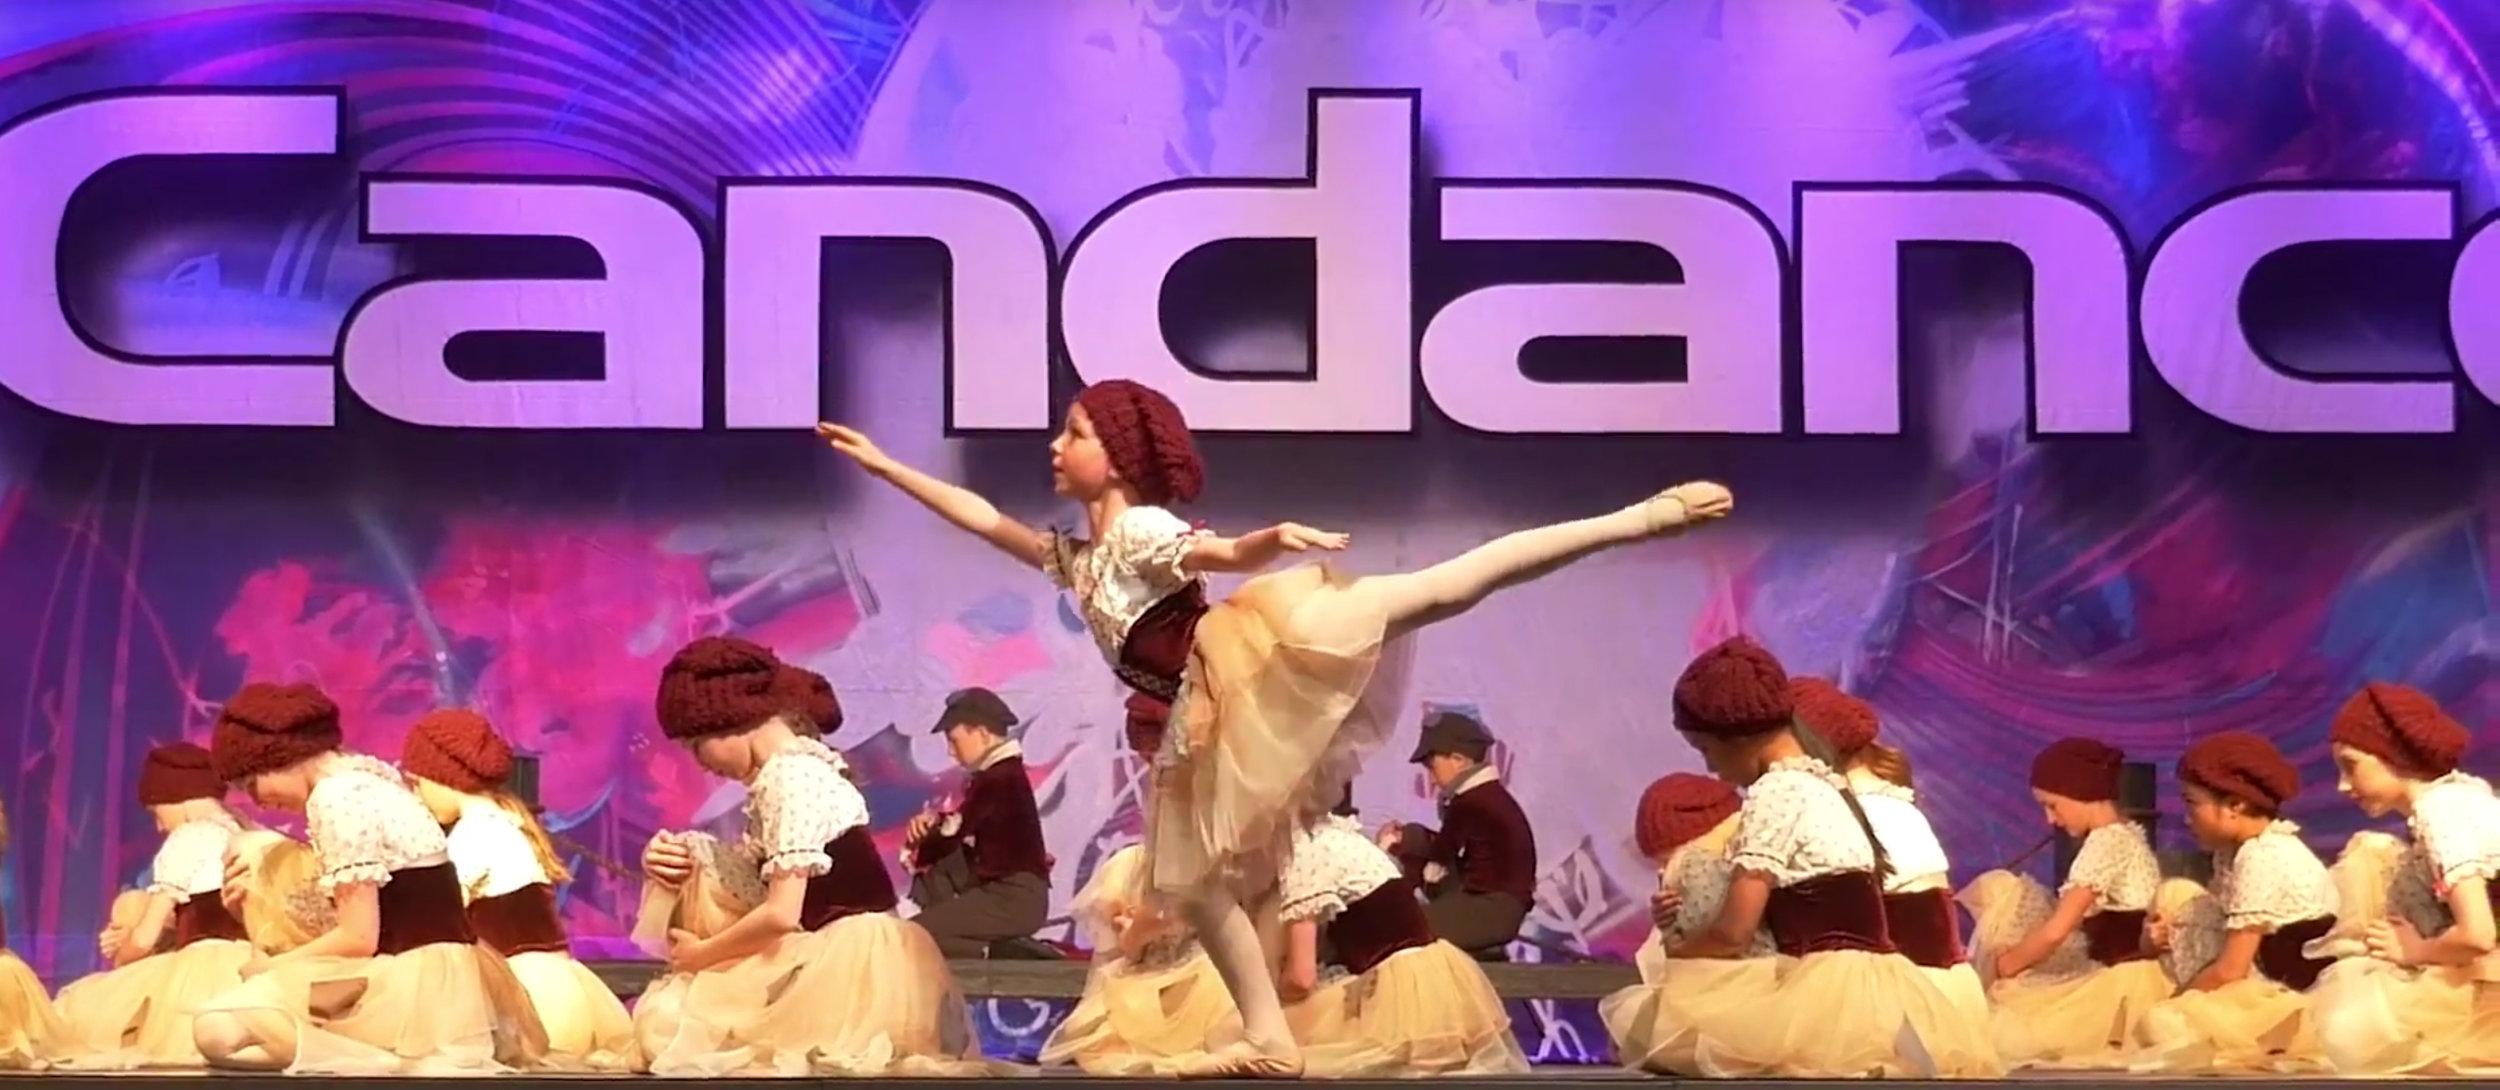 Candance stage 1.jpg